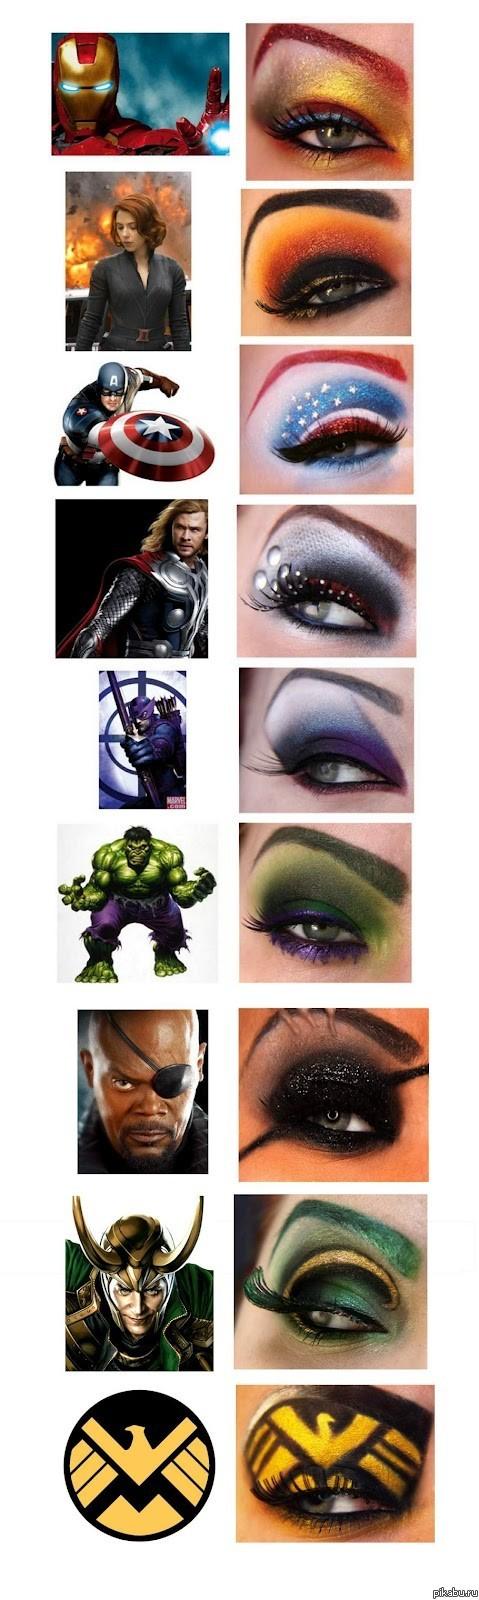 Superhero eye makeup